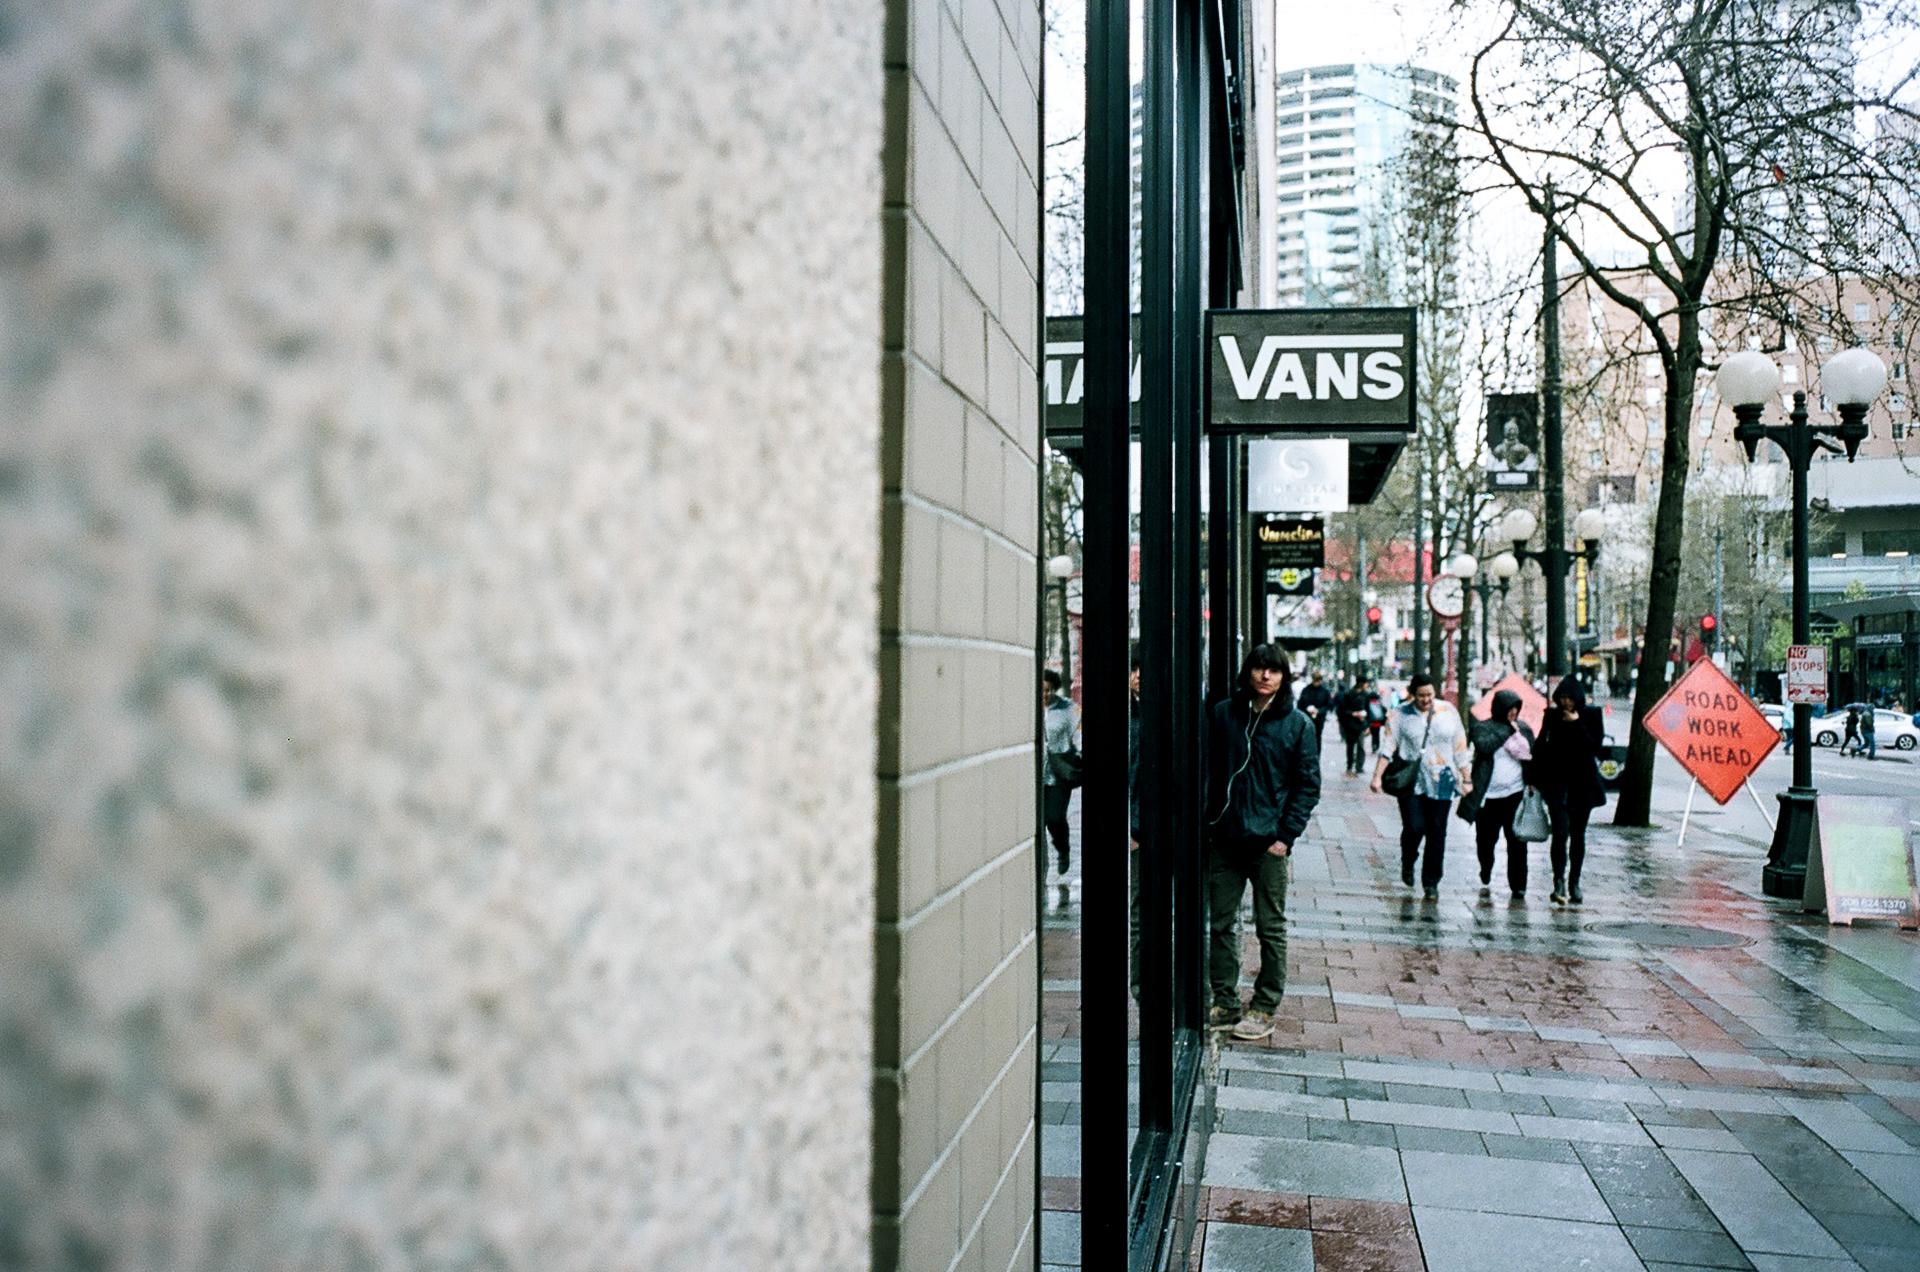 051117_JakePrice_Seattle-96380009.jpg